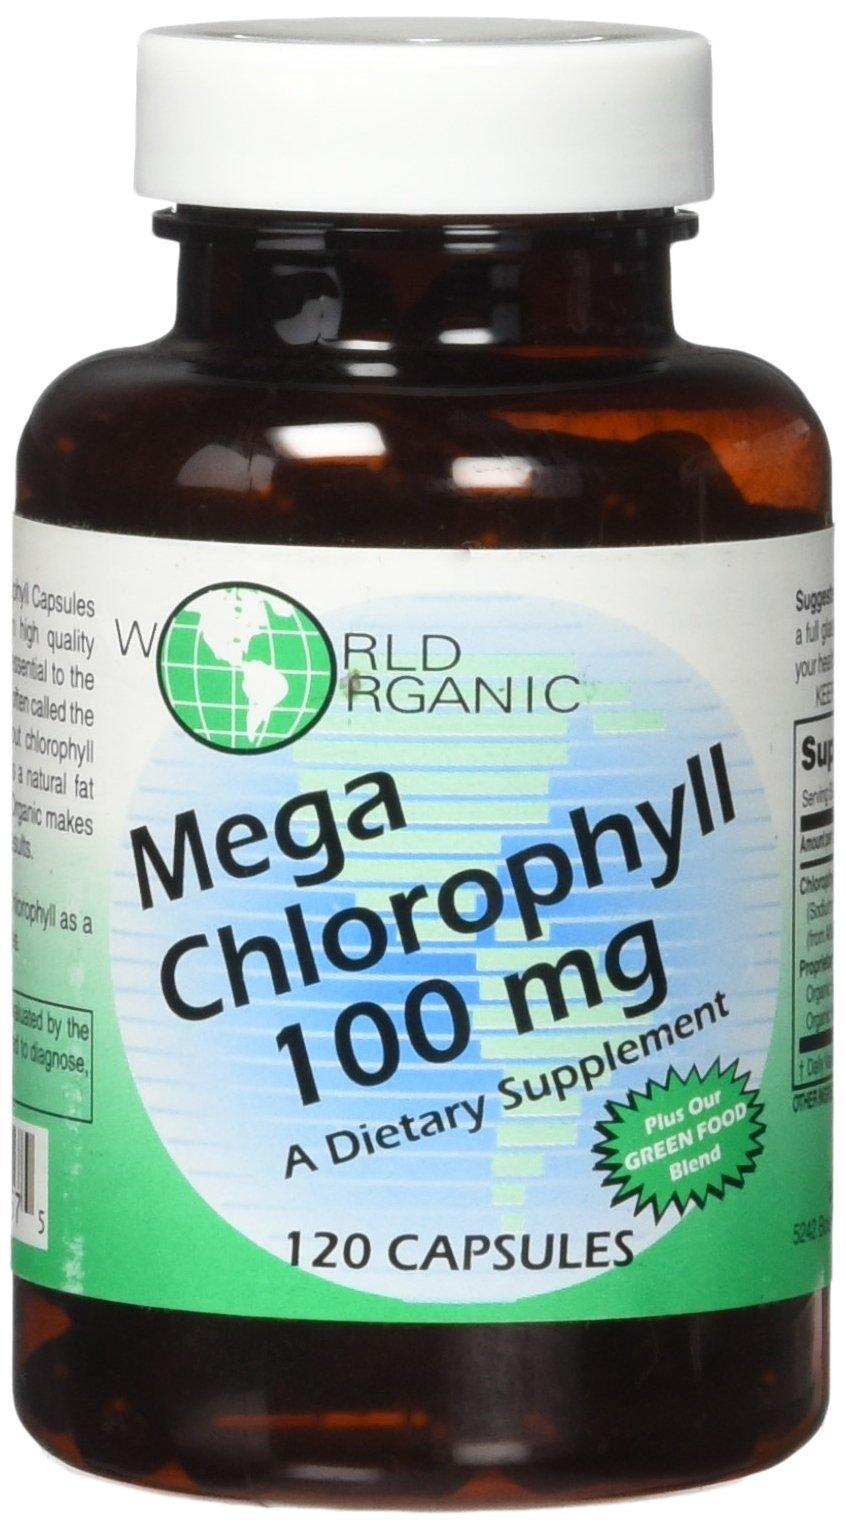 World Organics Chlorophyll Supplement 100 Mg 16 Ounce K Liquid Mega 120 Count